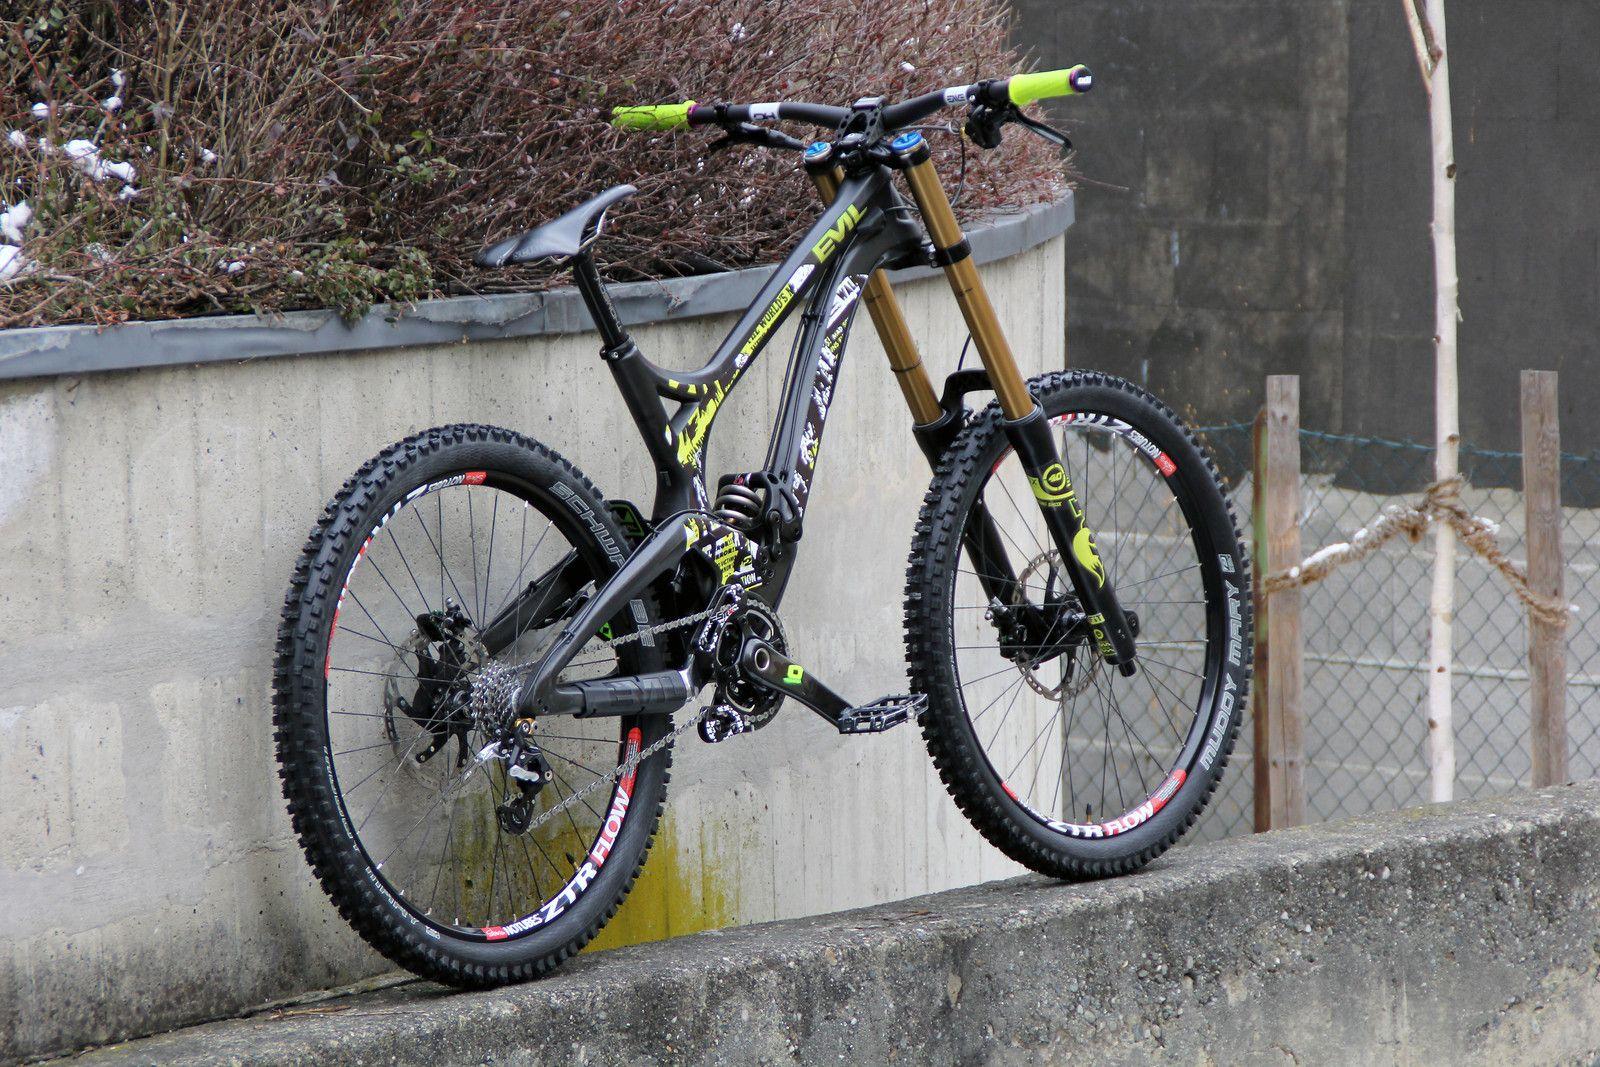 ee84523334d Evil Undead Carbon 2013 - xRS88x's Bike Check - Vital MTB   Bicycles ...